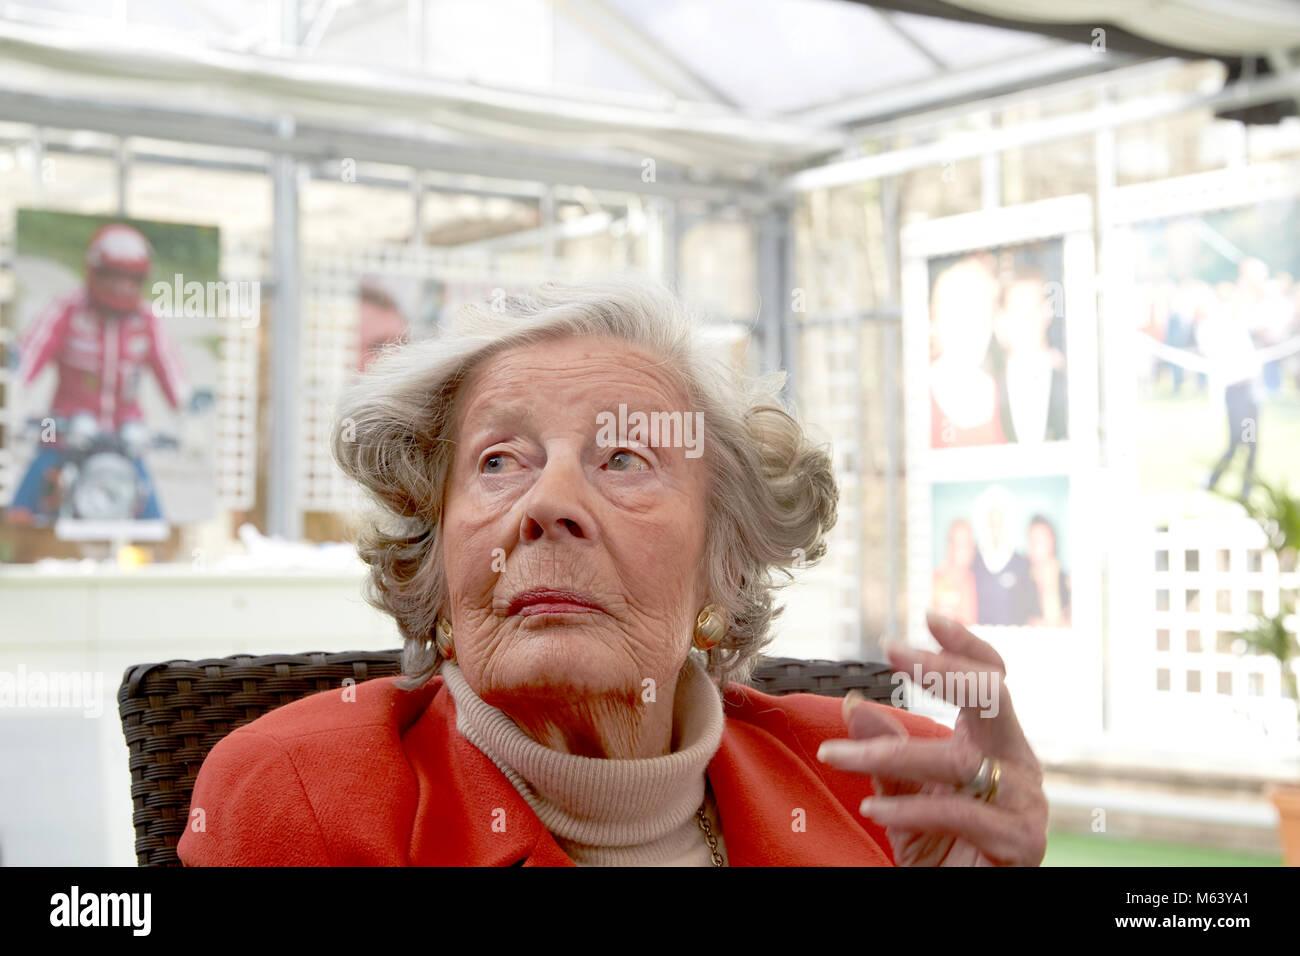 27 Febuary 2018, Germany, Bendoirf-Sayn: Marianne, Dowager Princess zu Sayn-Wittgenstein-Sayn, also known as 'Mamarazza' - Stock Image